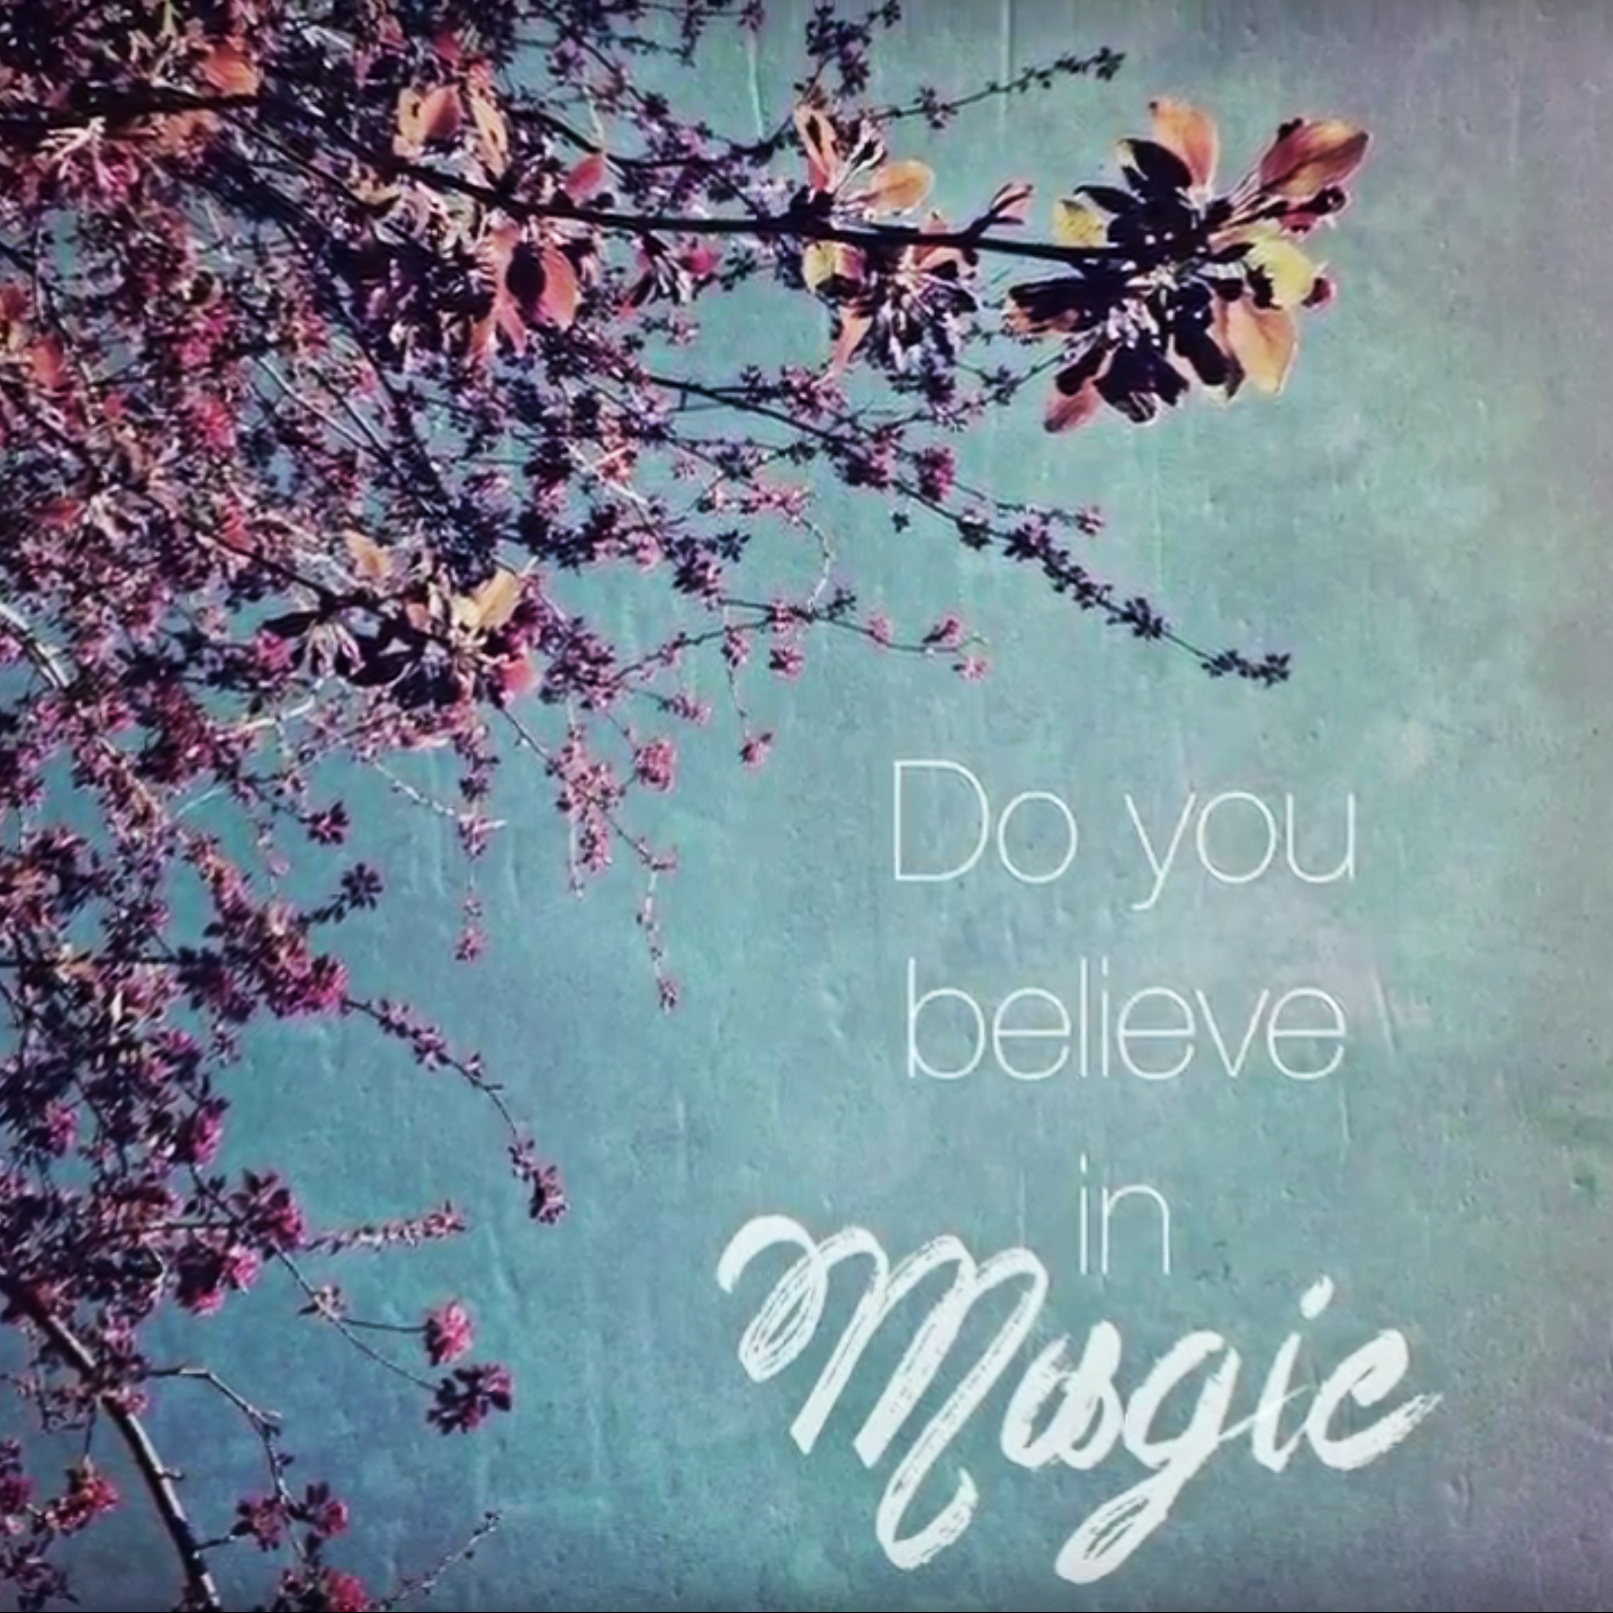 Do you believe in magic?- Art is magic.online